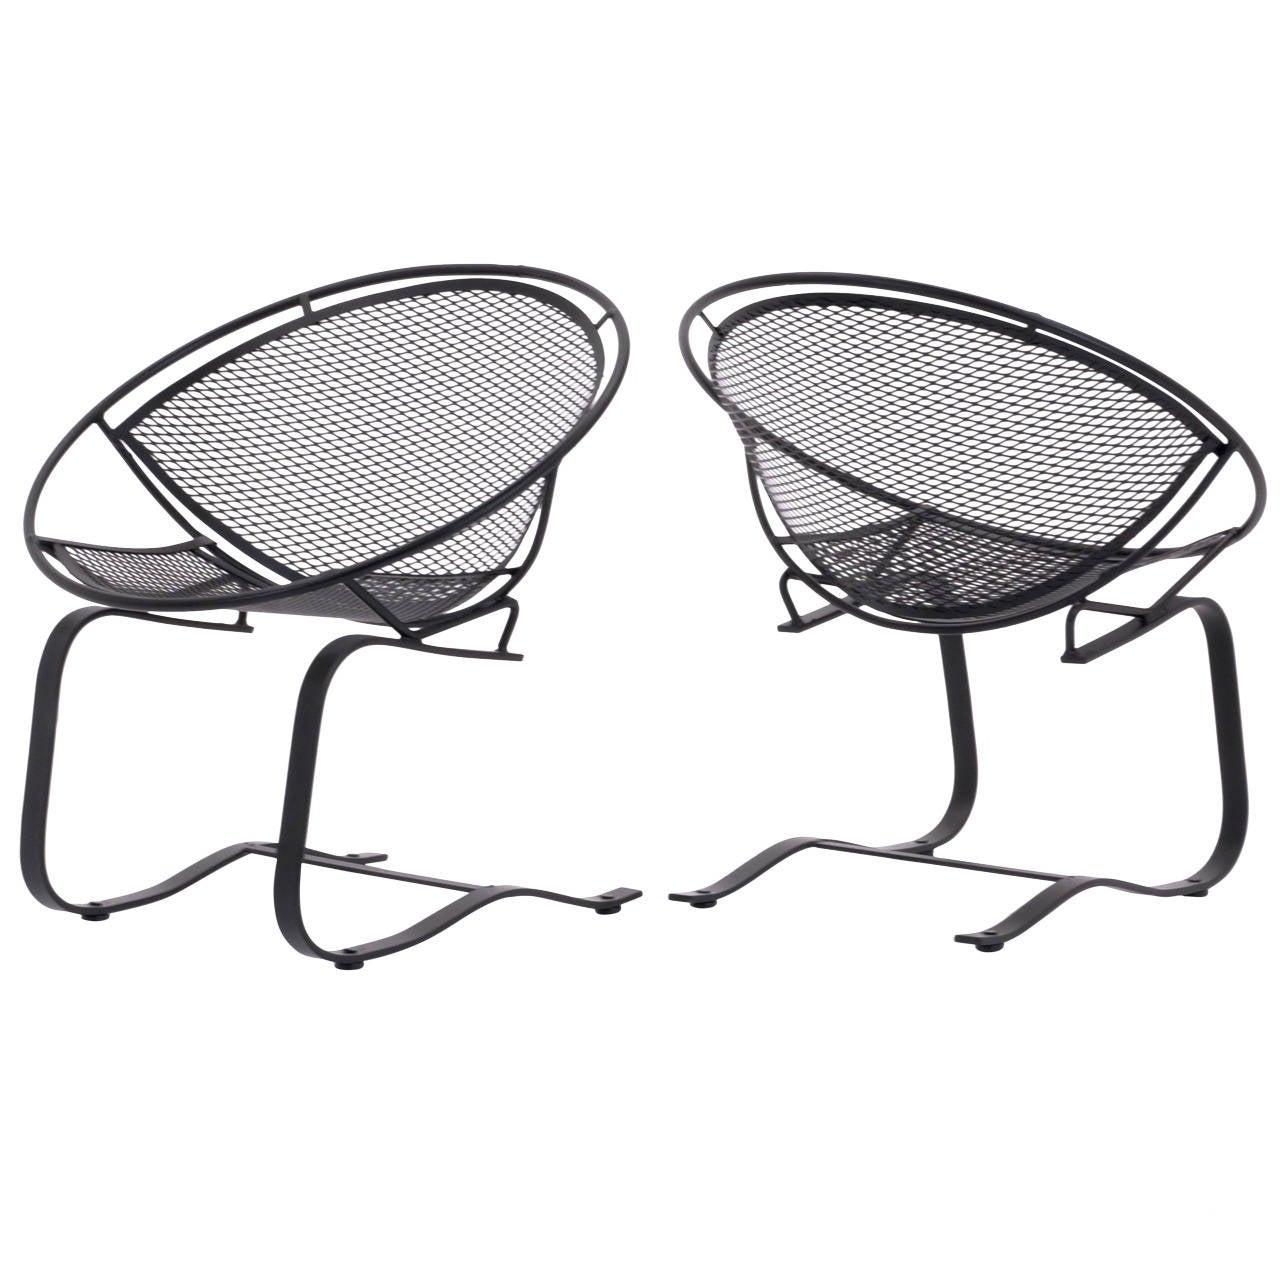 John Salterini Springer Outdoor Patio Lounge Chairs at 1stdibs